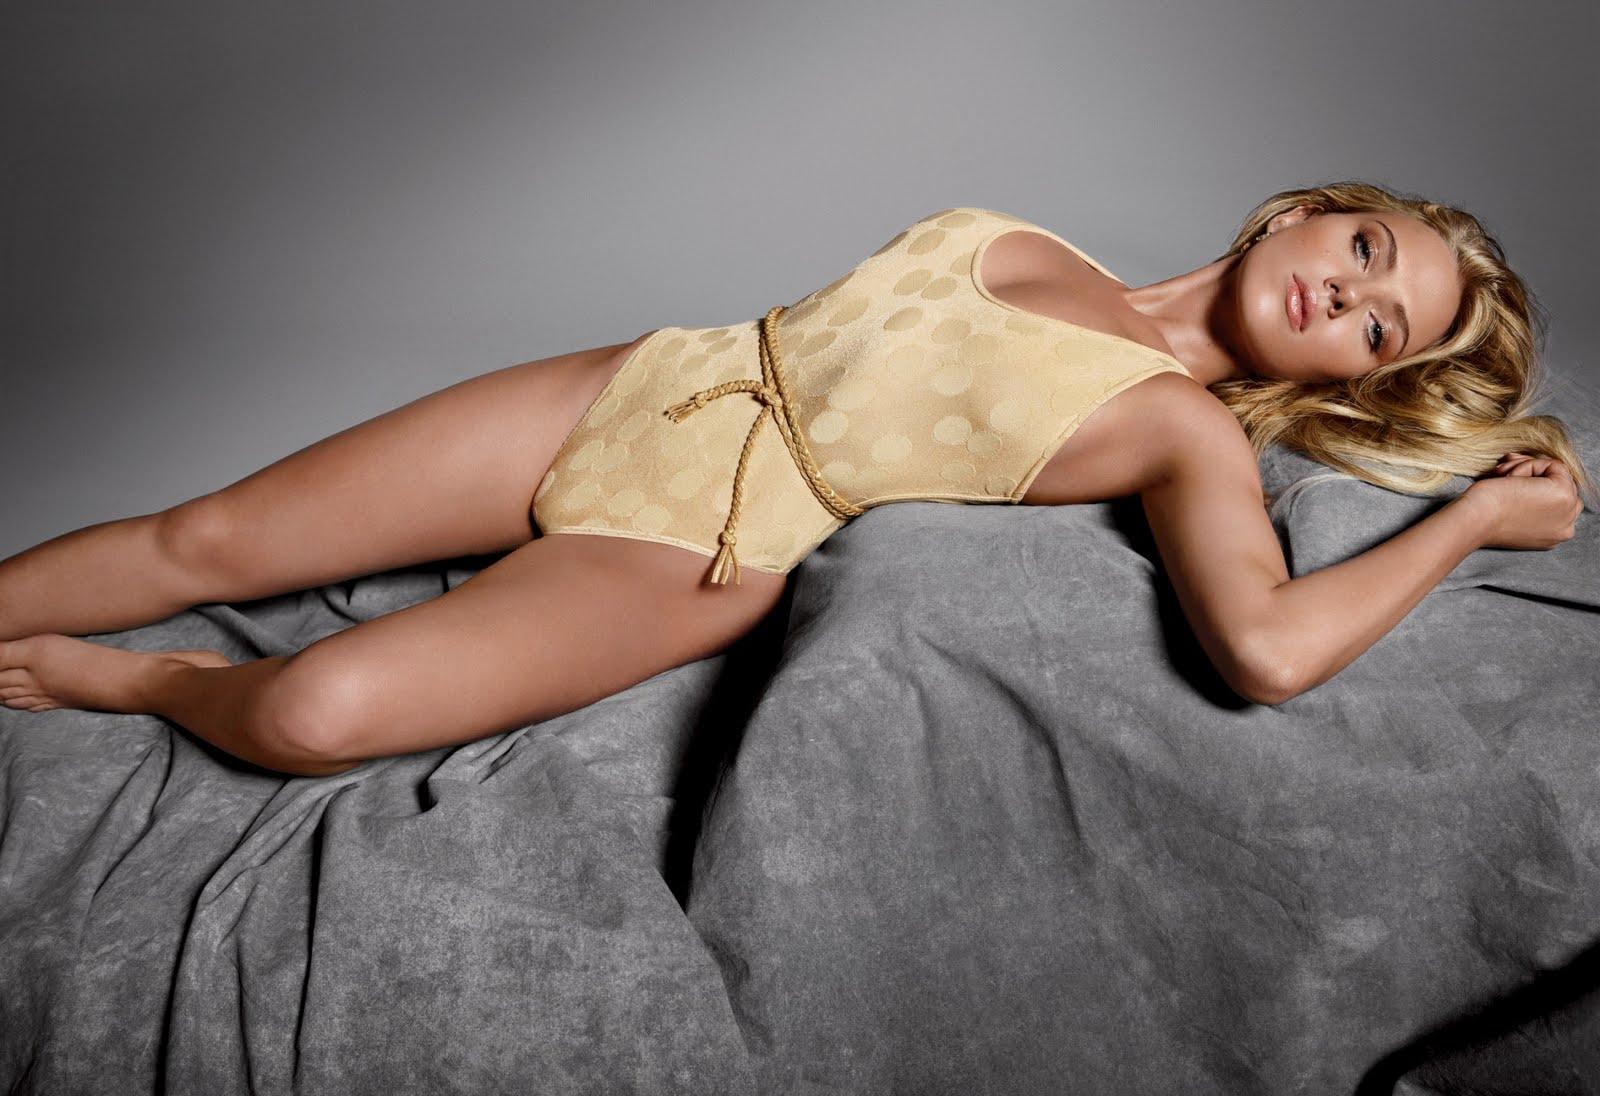 http://2.bp.blogspot.com/_8bh00i14aFQ/TTrasqUmILI/AAAAAAAABc4/AepLSImEELI/s1600/37378_Scarlett_Johansson_for_GQ_magazine_123_175lo.jpg